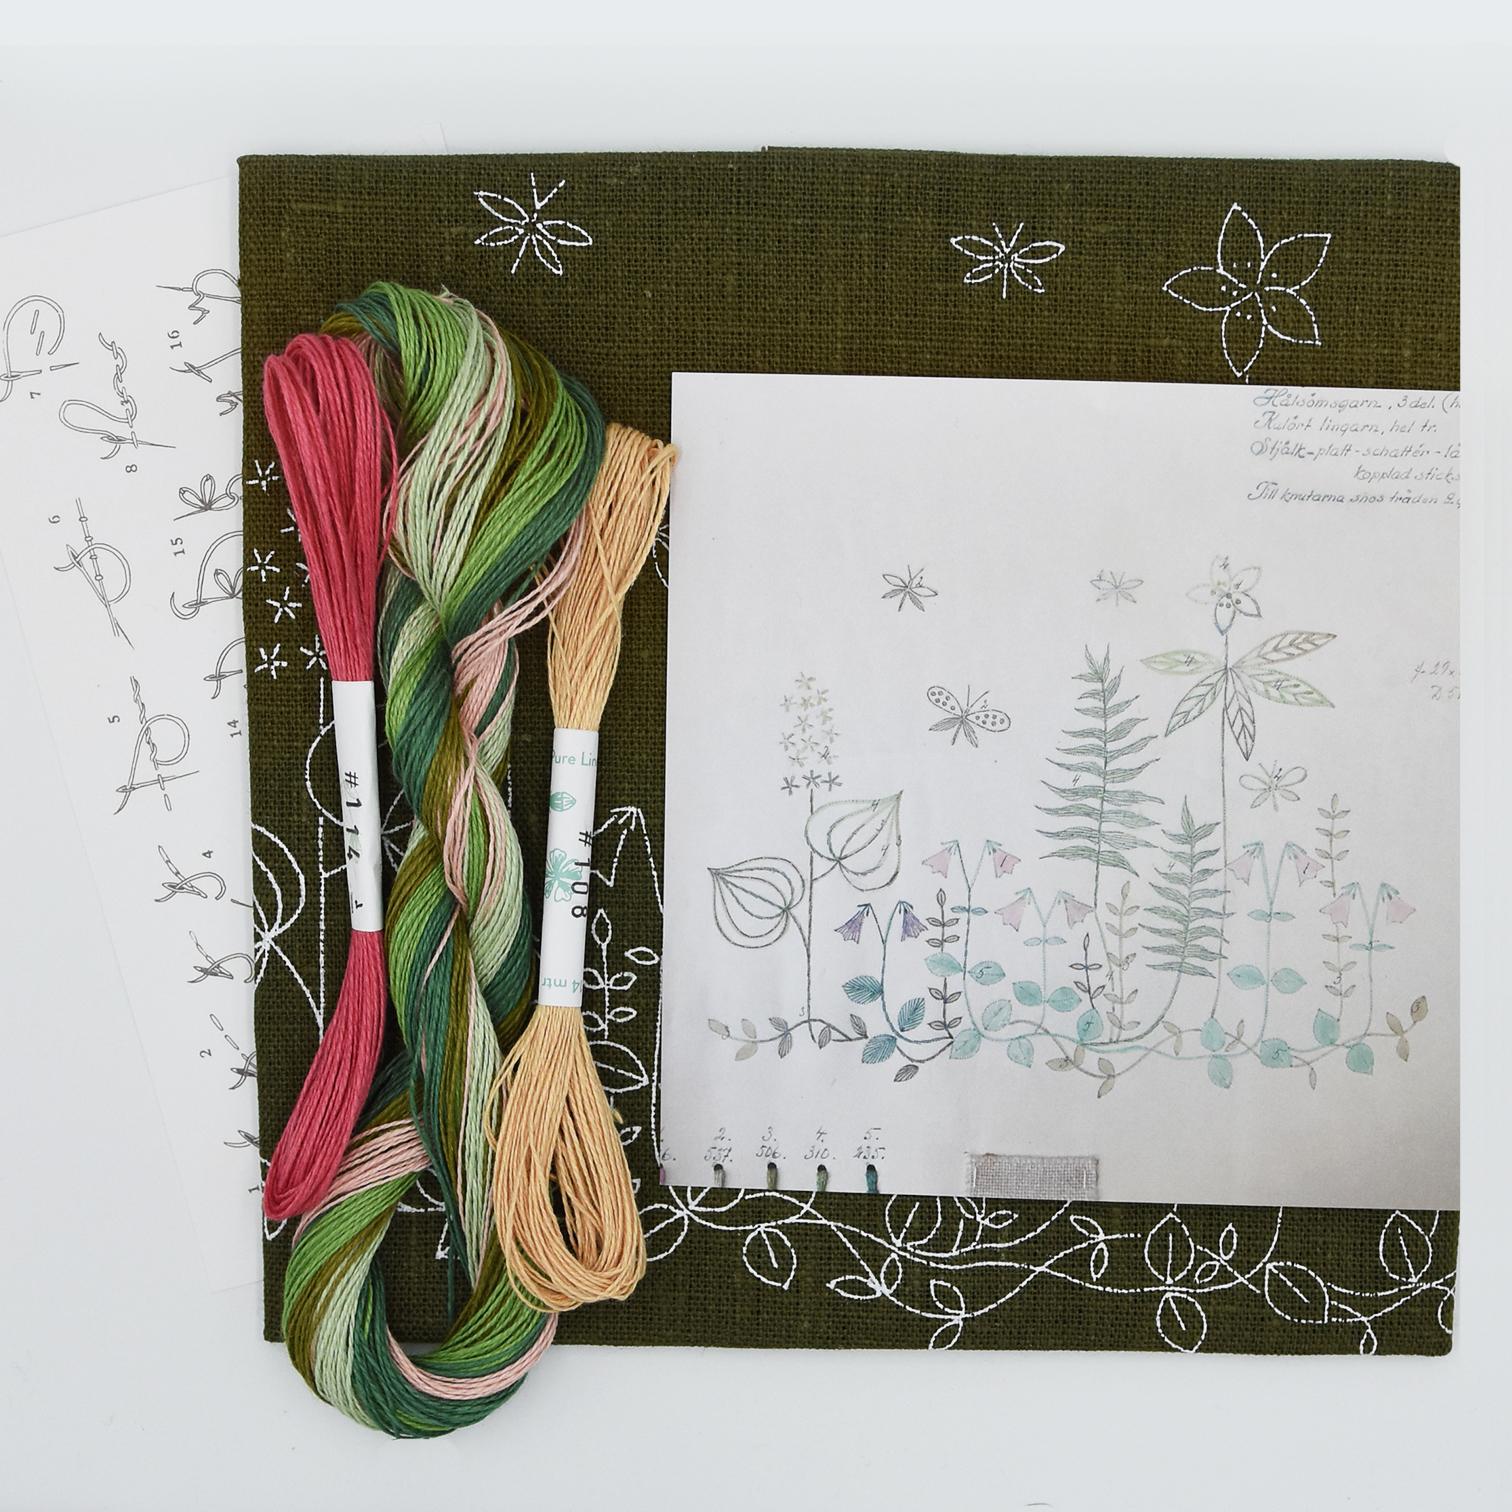 Linladan - Linneaus - Swedish Embroidery Kit 72